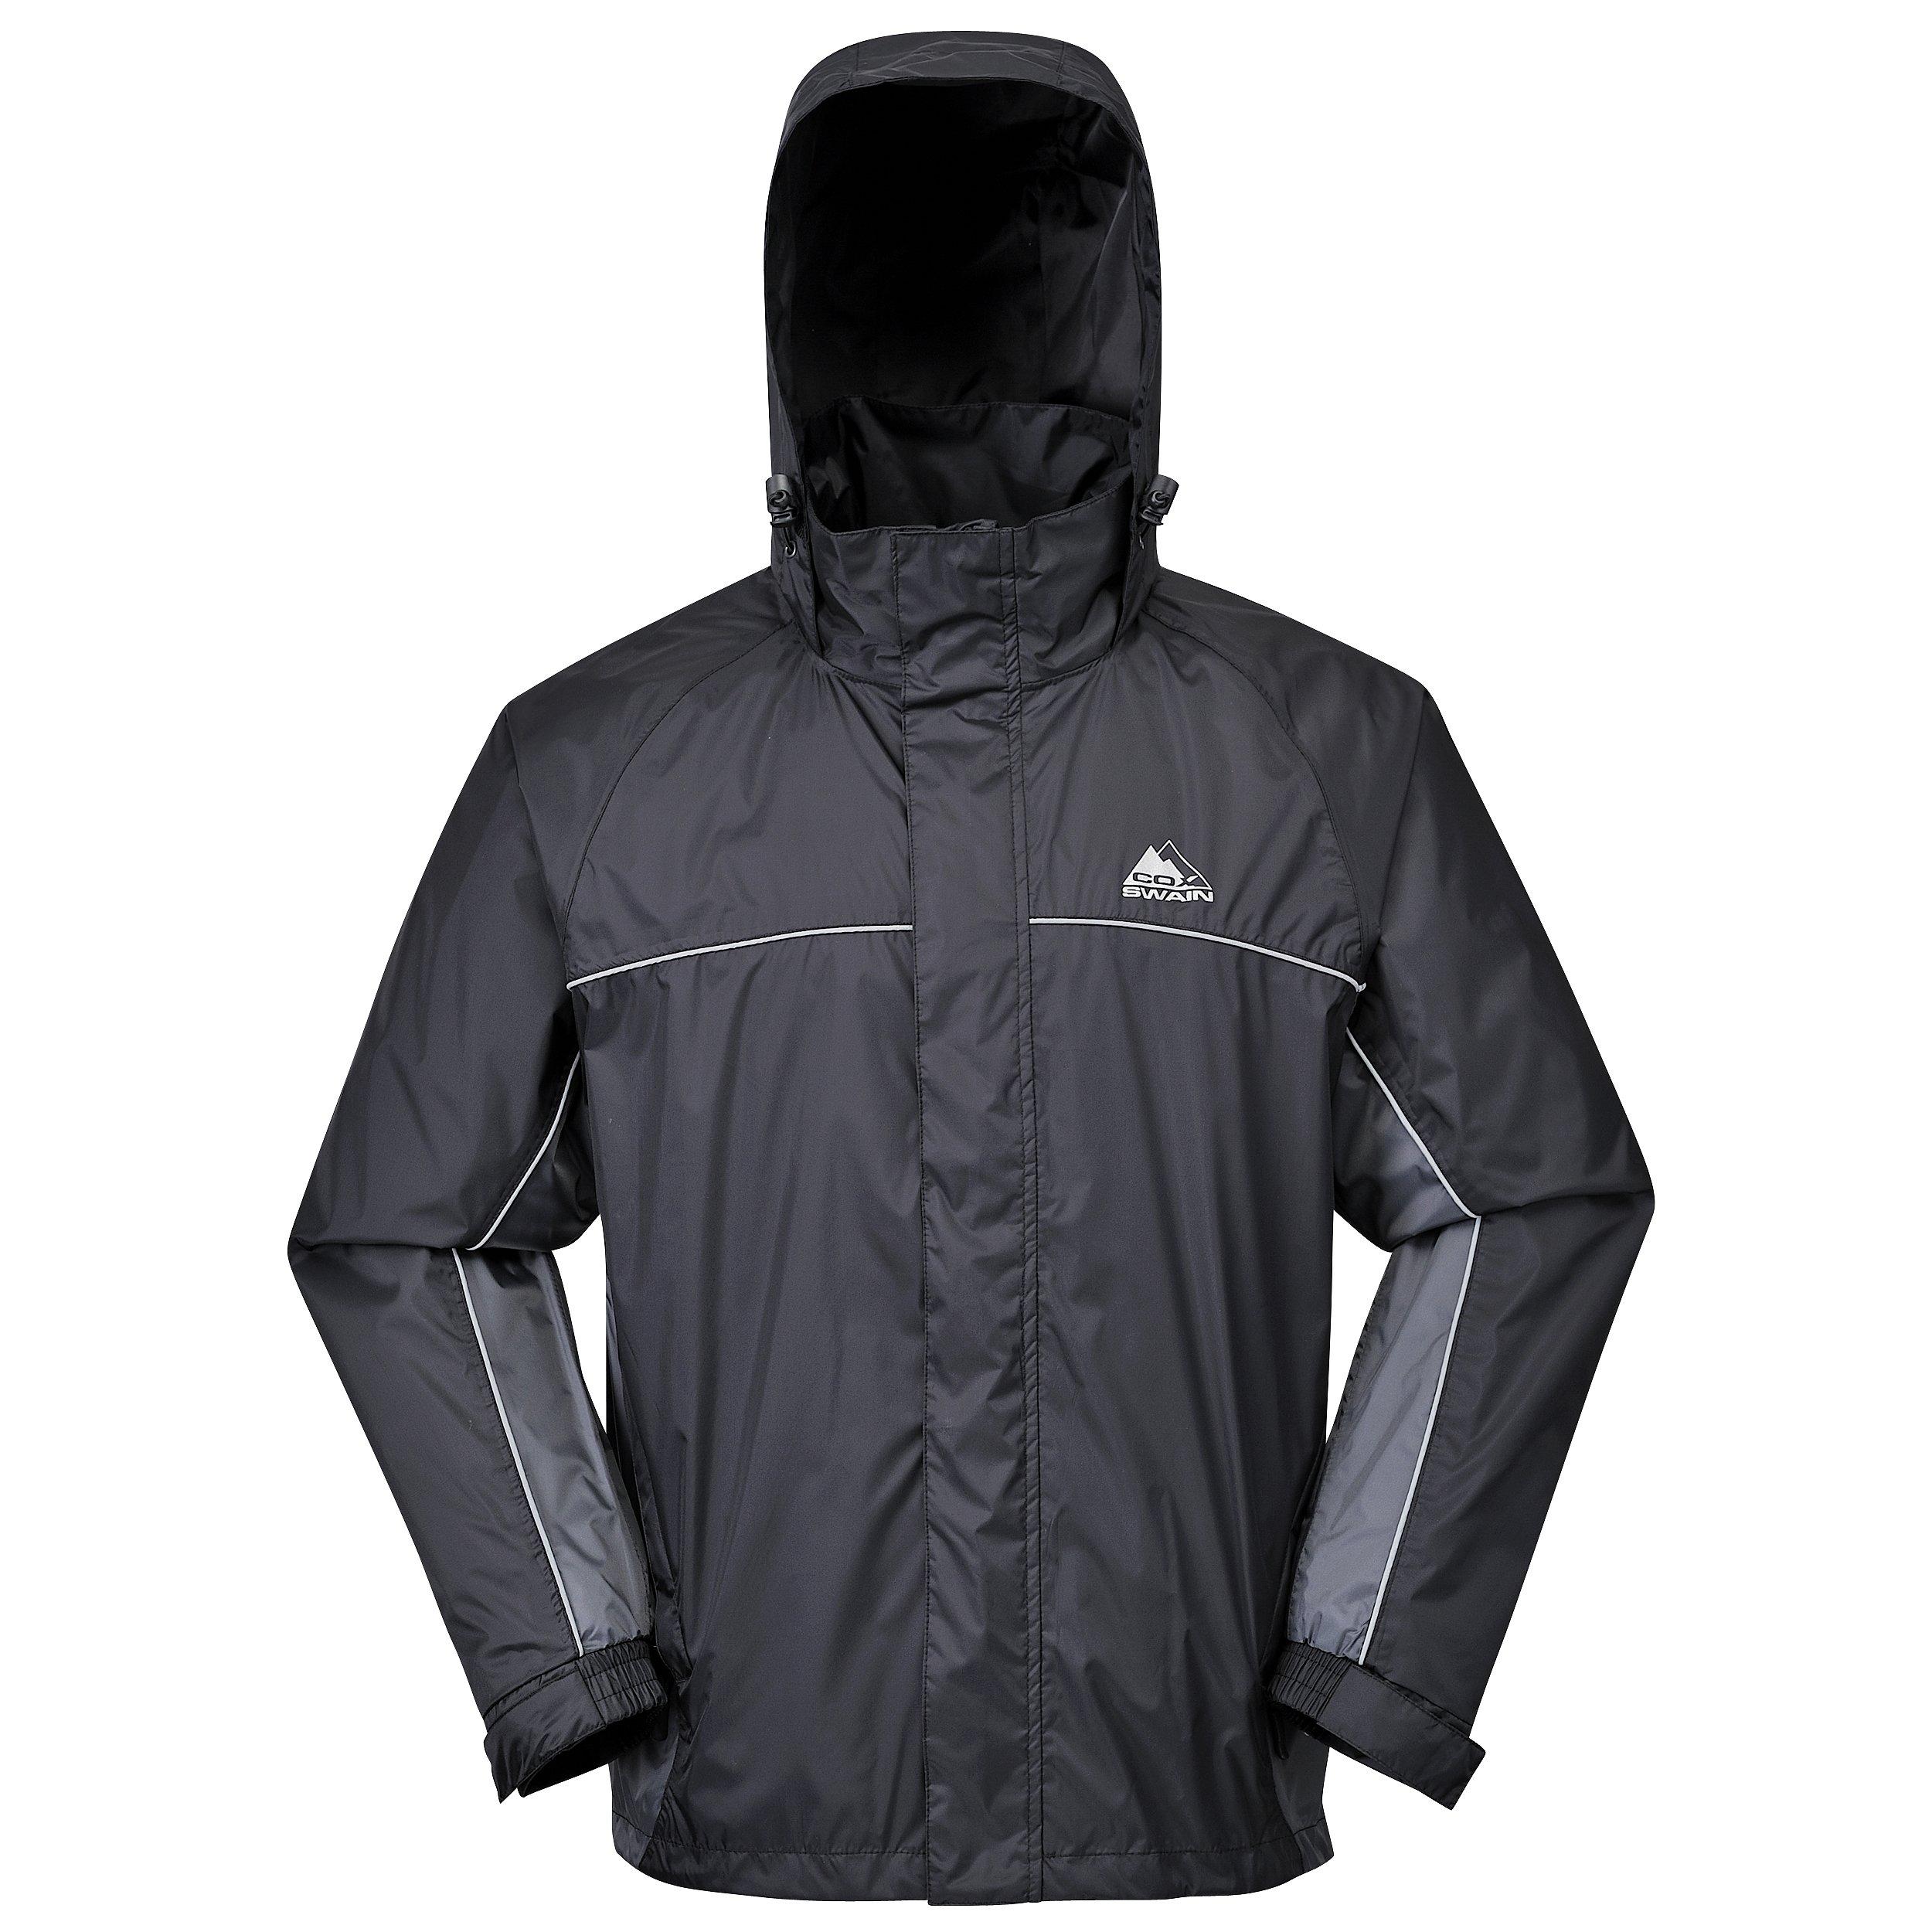 Kleidung & Accessoires Freundschaftlich Regen Jacke Hose Anzug Regenschutz Regenanzug Regenjacke Regenhose Kapuze Sport